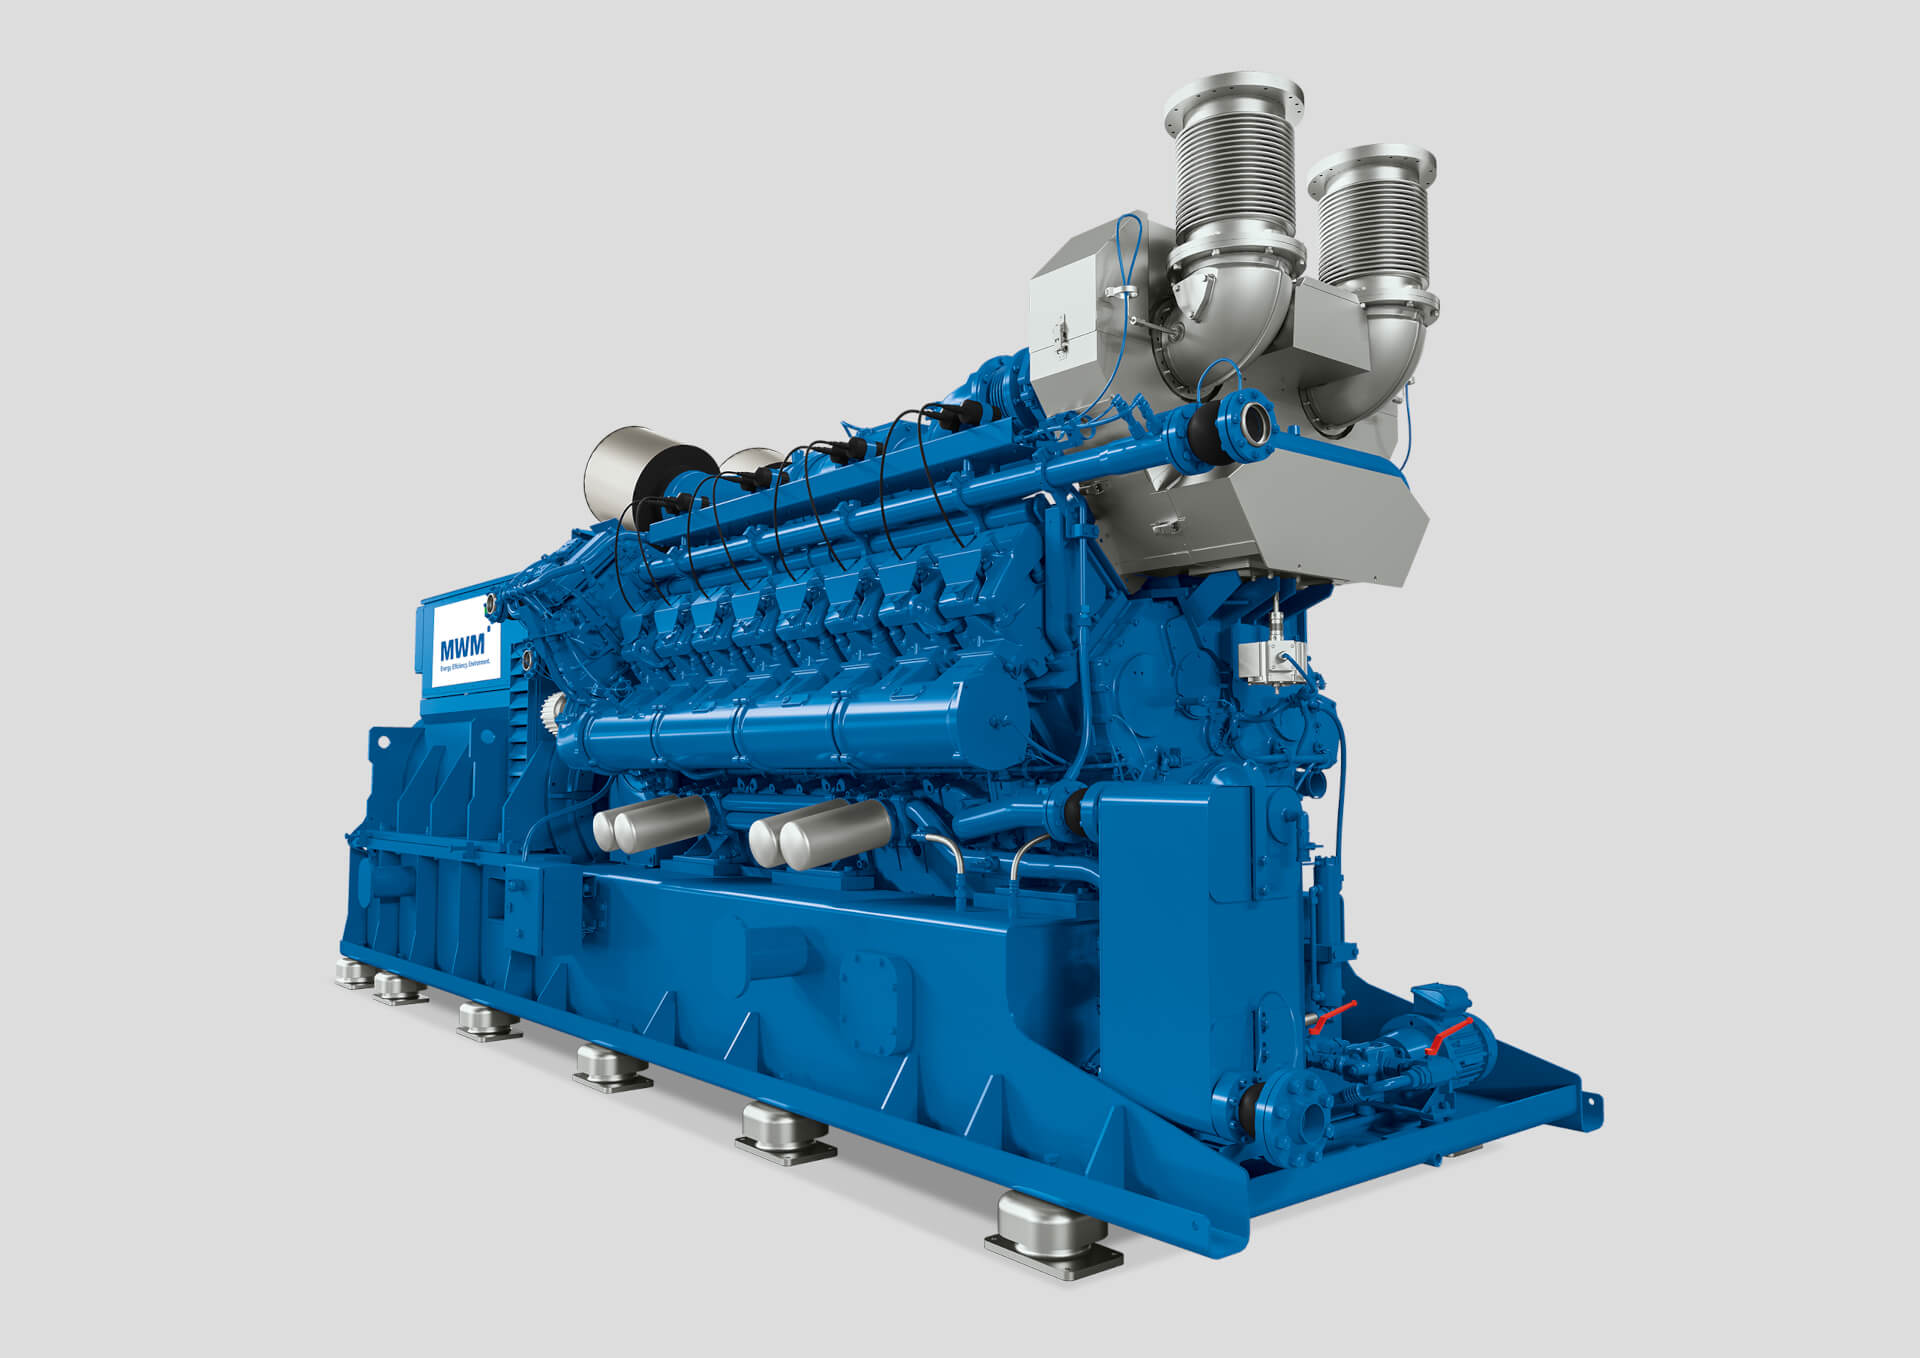 MWM TCG 3020 V16 engine